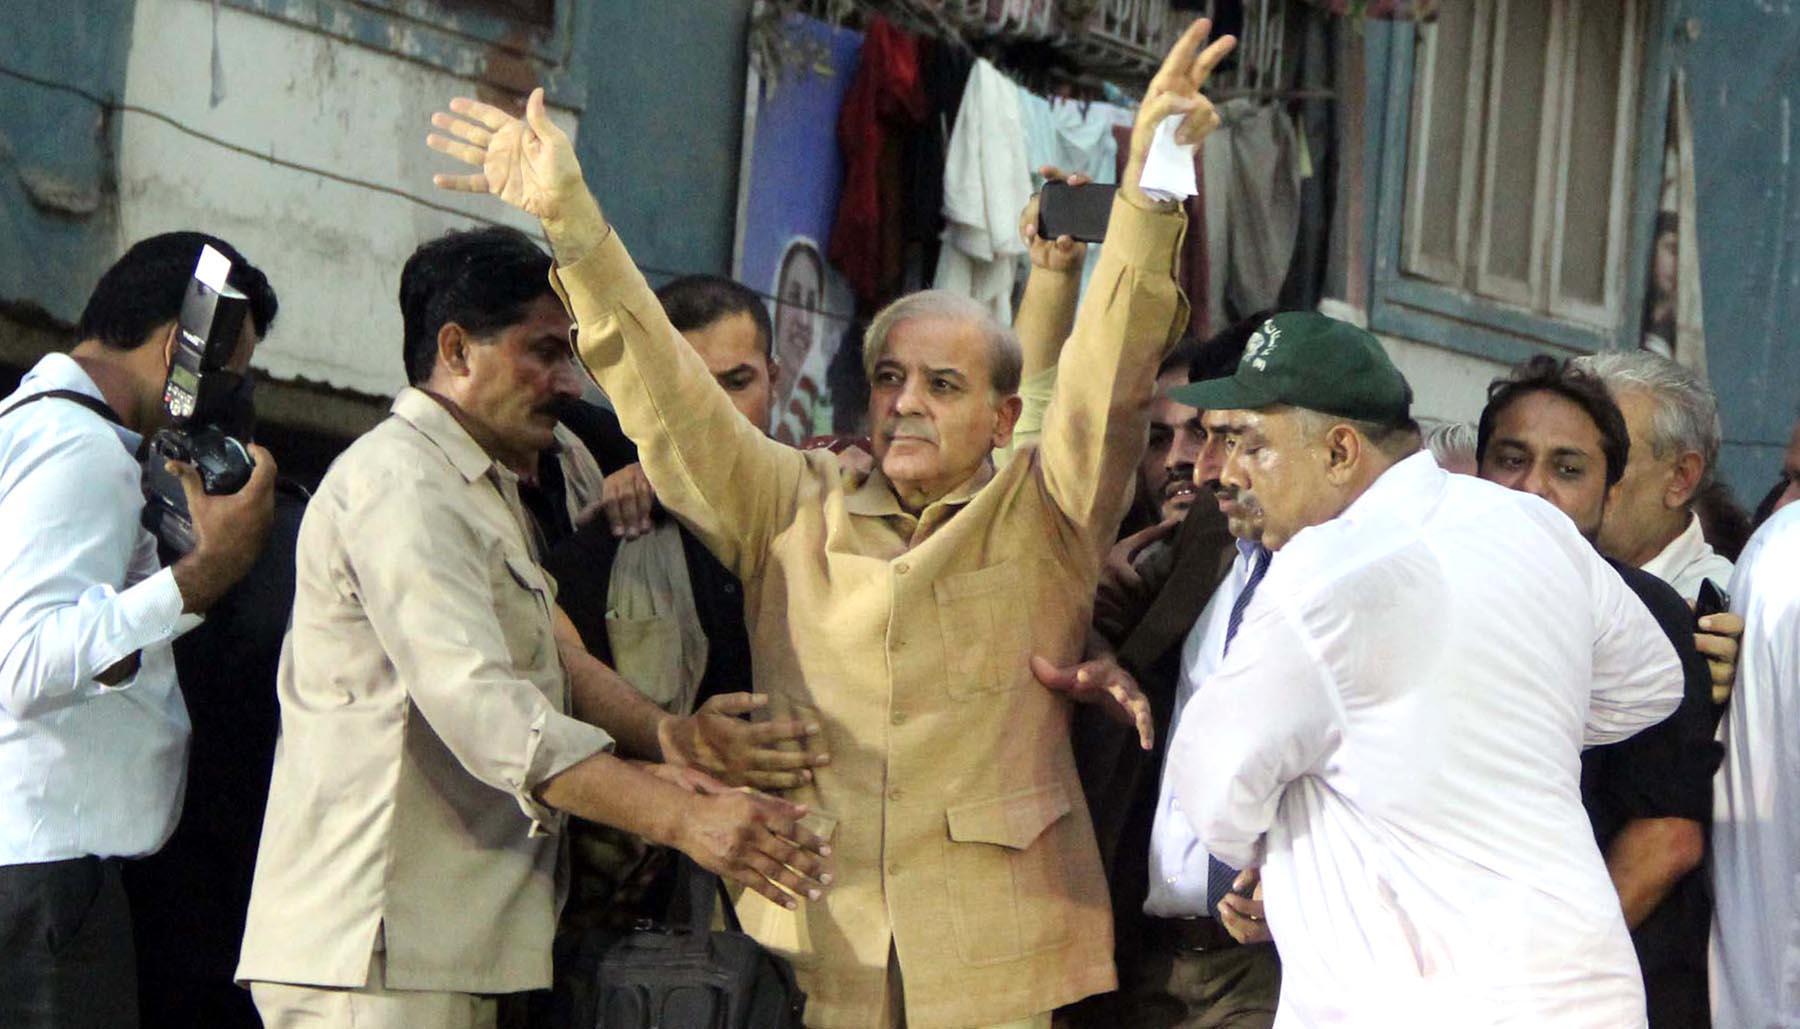 Pakistan Muslim League-Nawaz President Shehbaz Sharif waves to his supporters during the public meeting at Khadda Market Lyari. Photo: Online